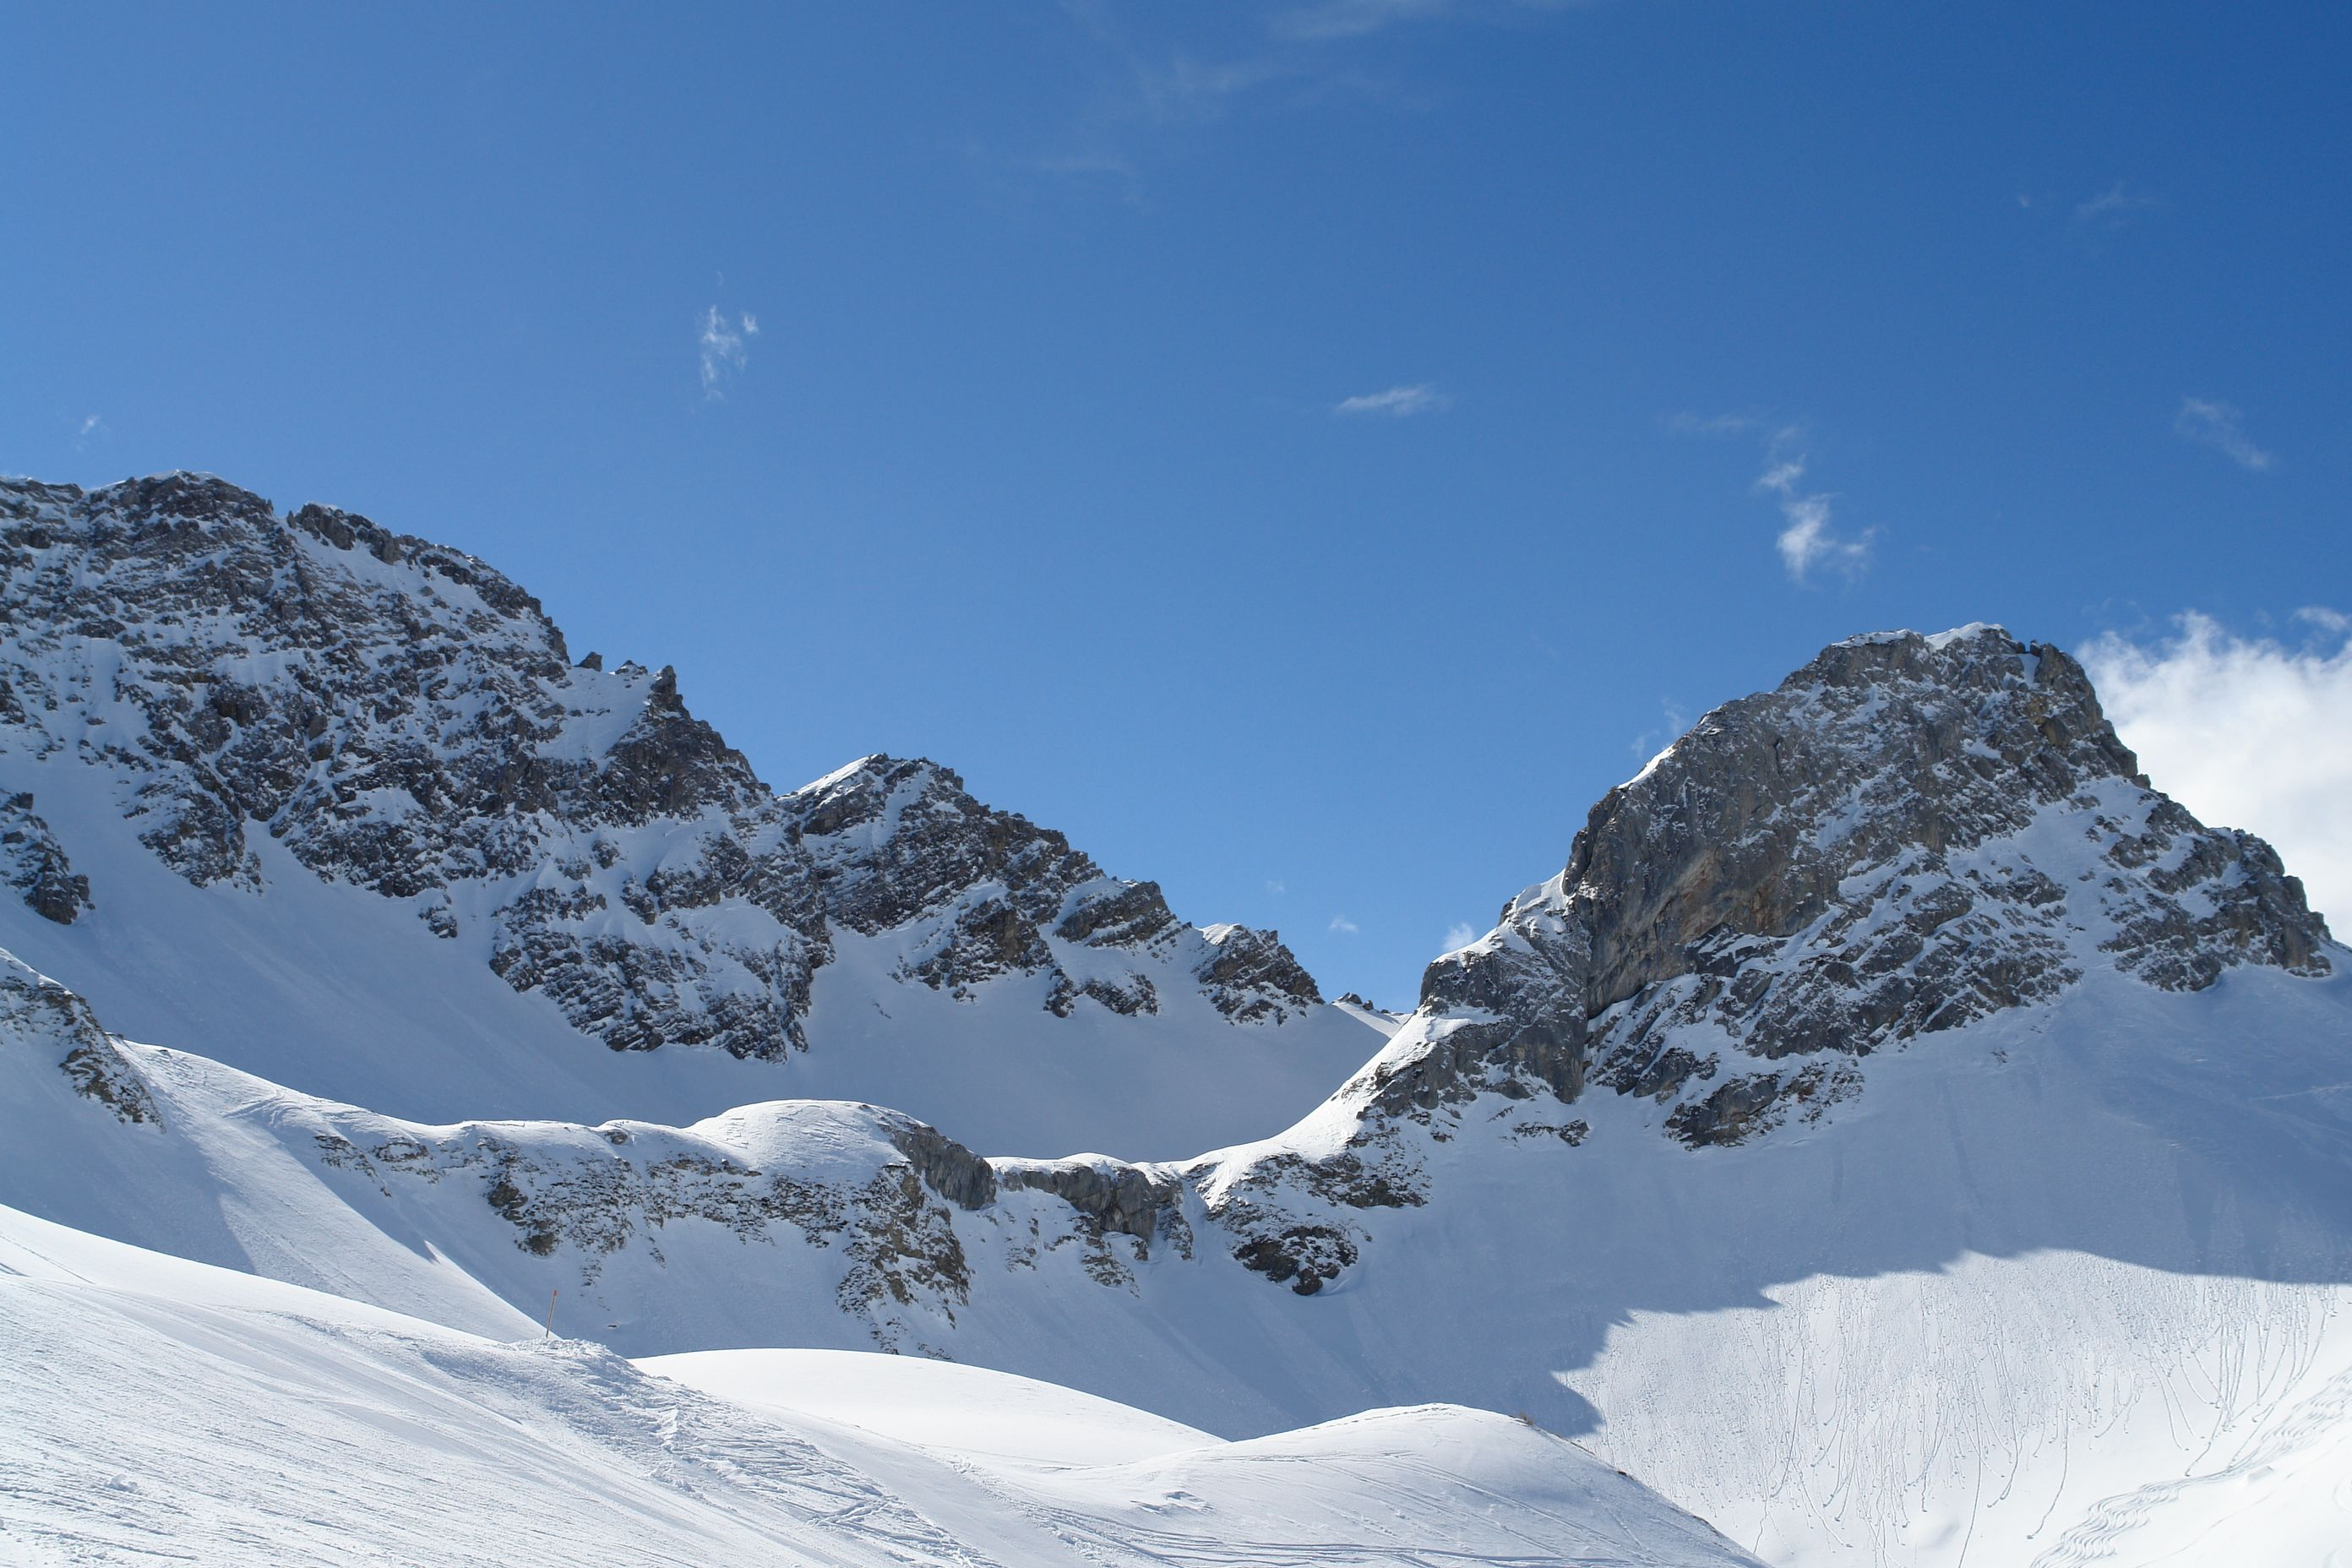 Aktiv im Winter – Warth am Arlberg (c) Erik bij de Vaate